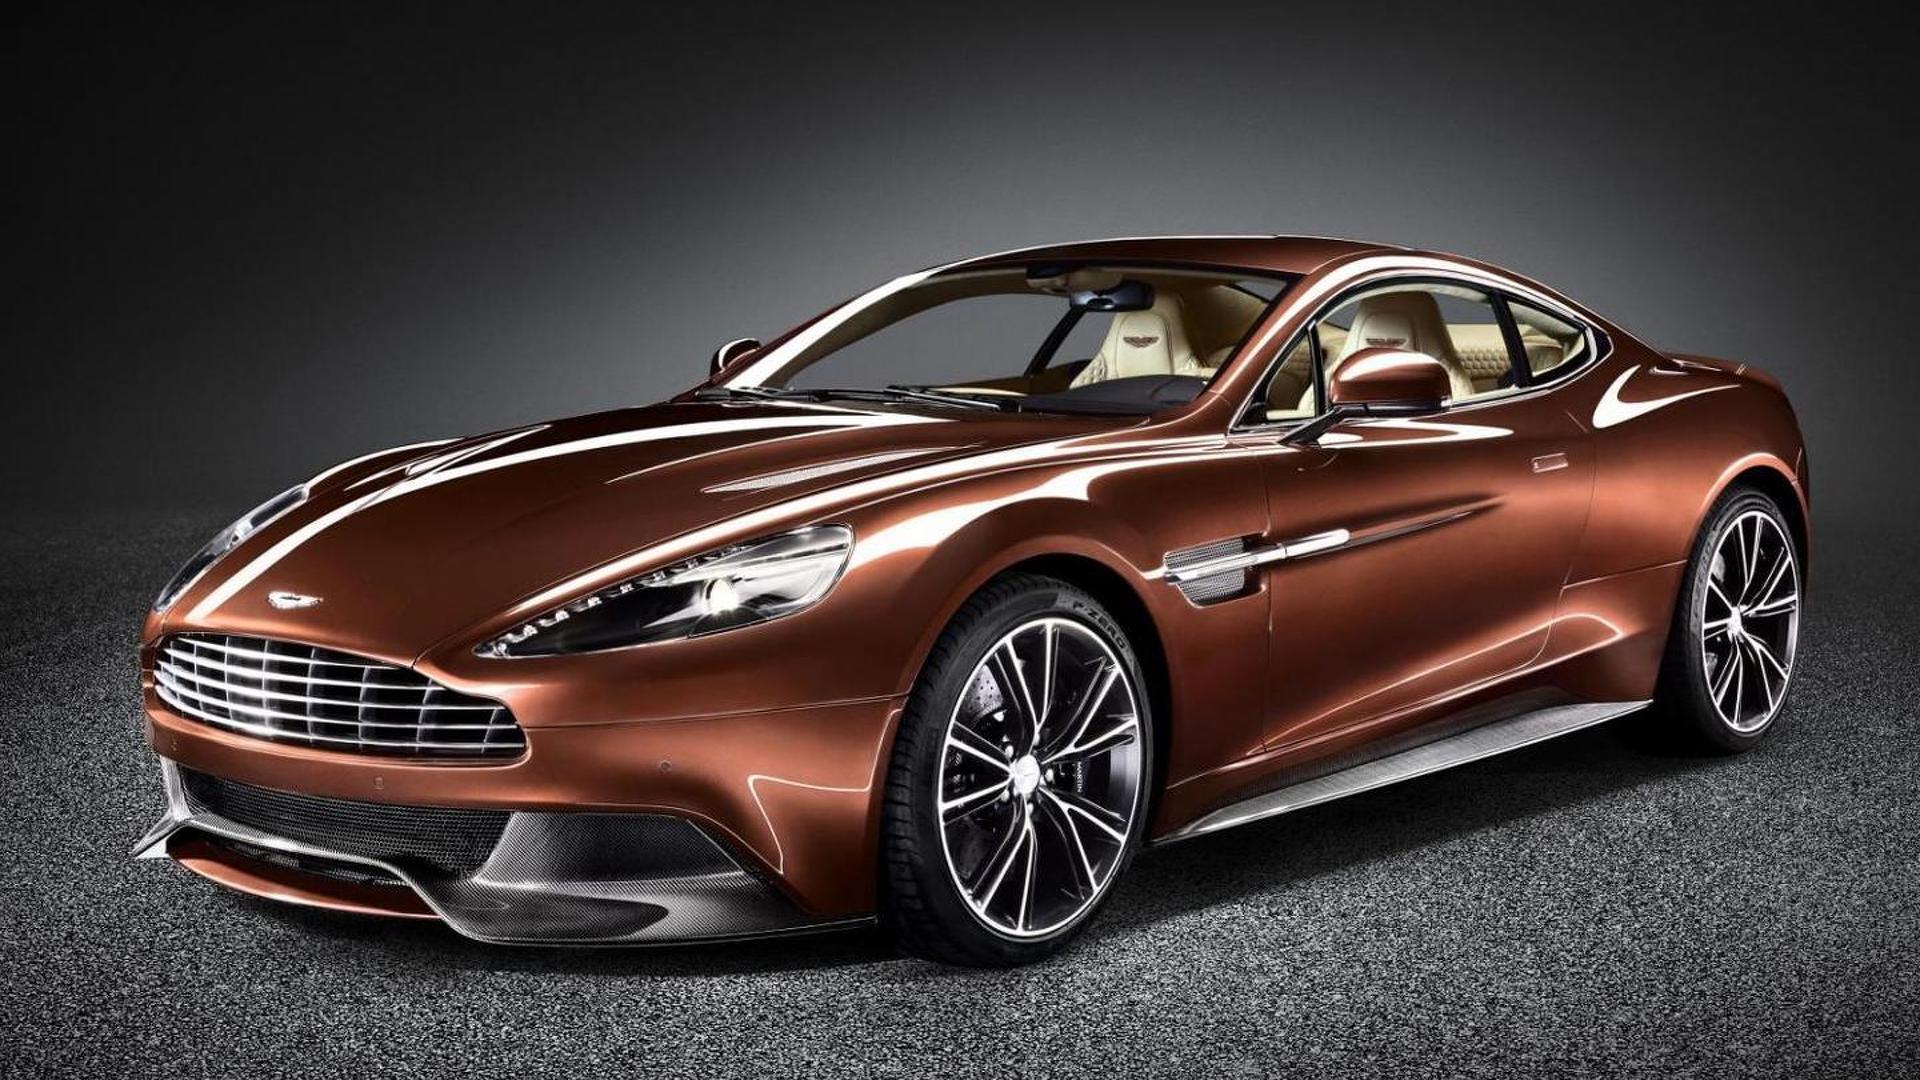 Aston Martin Vanquish hits the street [video]